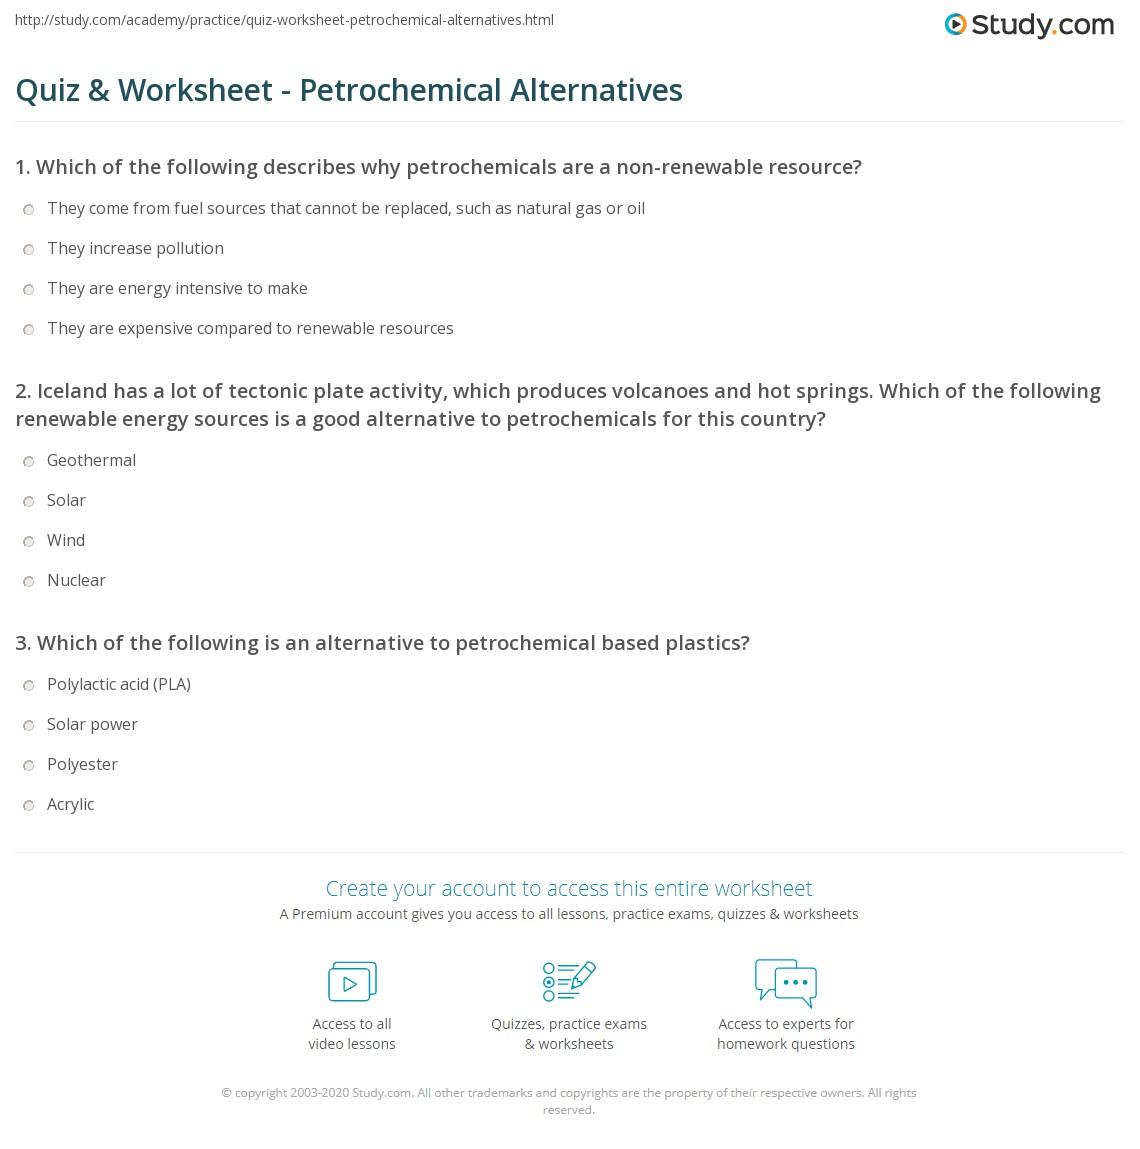 Quiz & Worksheet - Petrochemical Alternatives | Study com